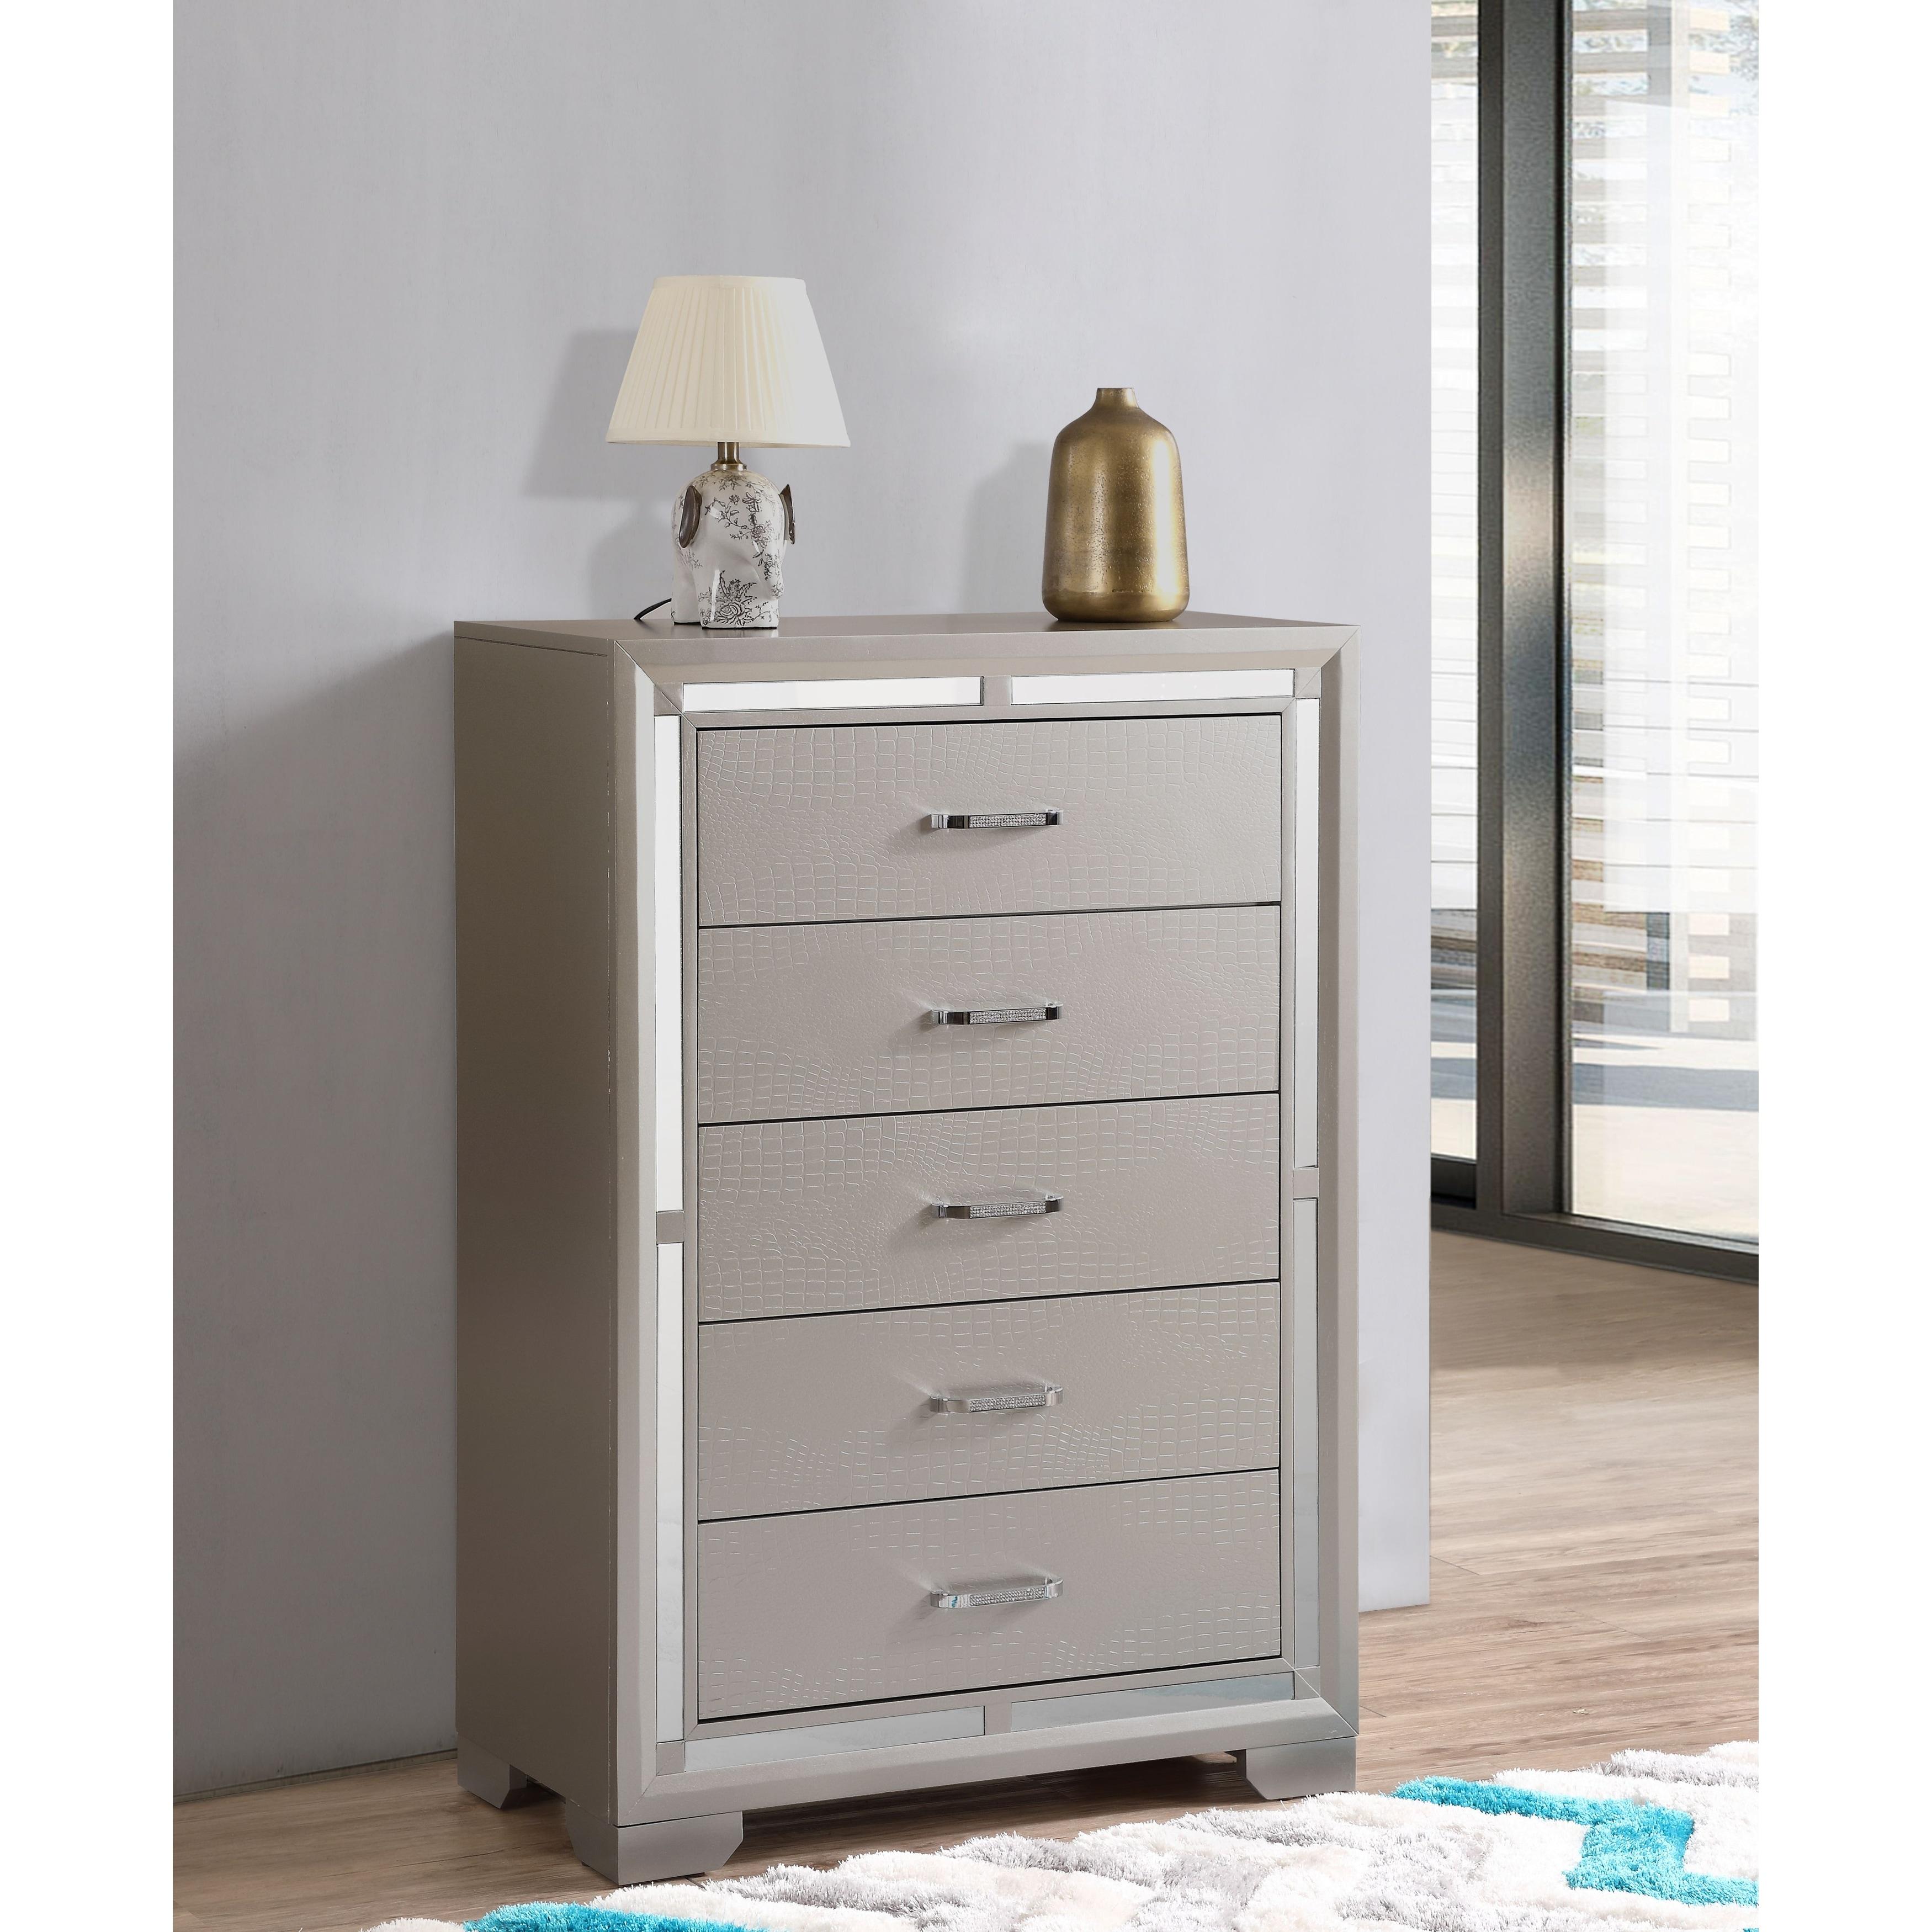 Alana Wood 5 Drawer Bedroom Chest Overstock 32545903